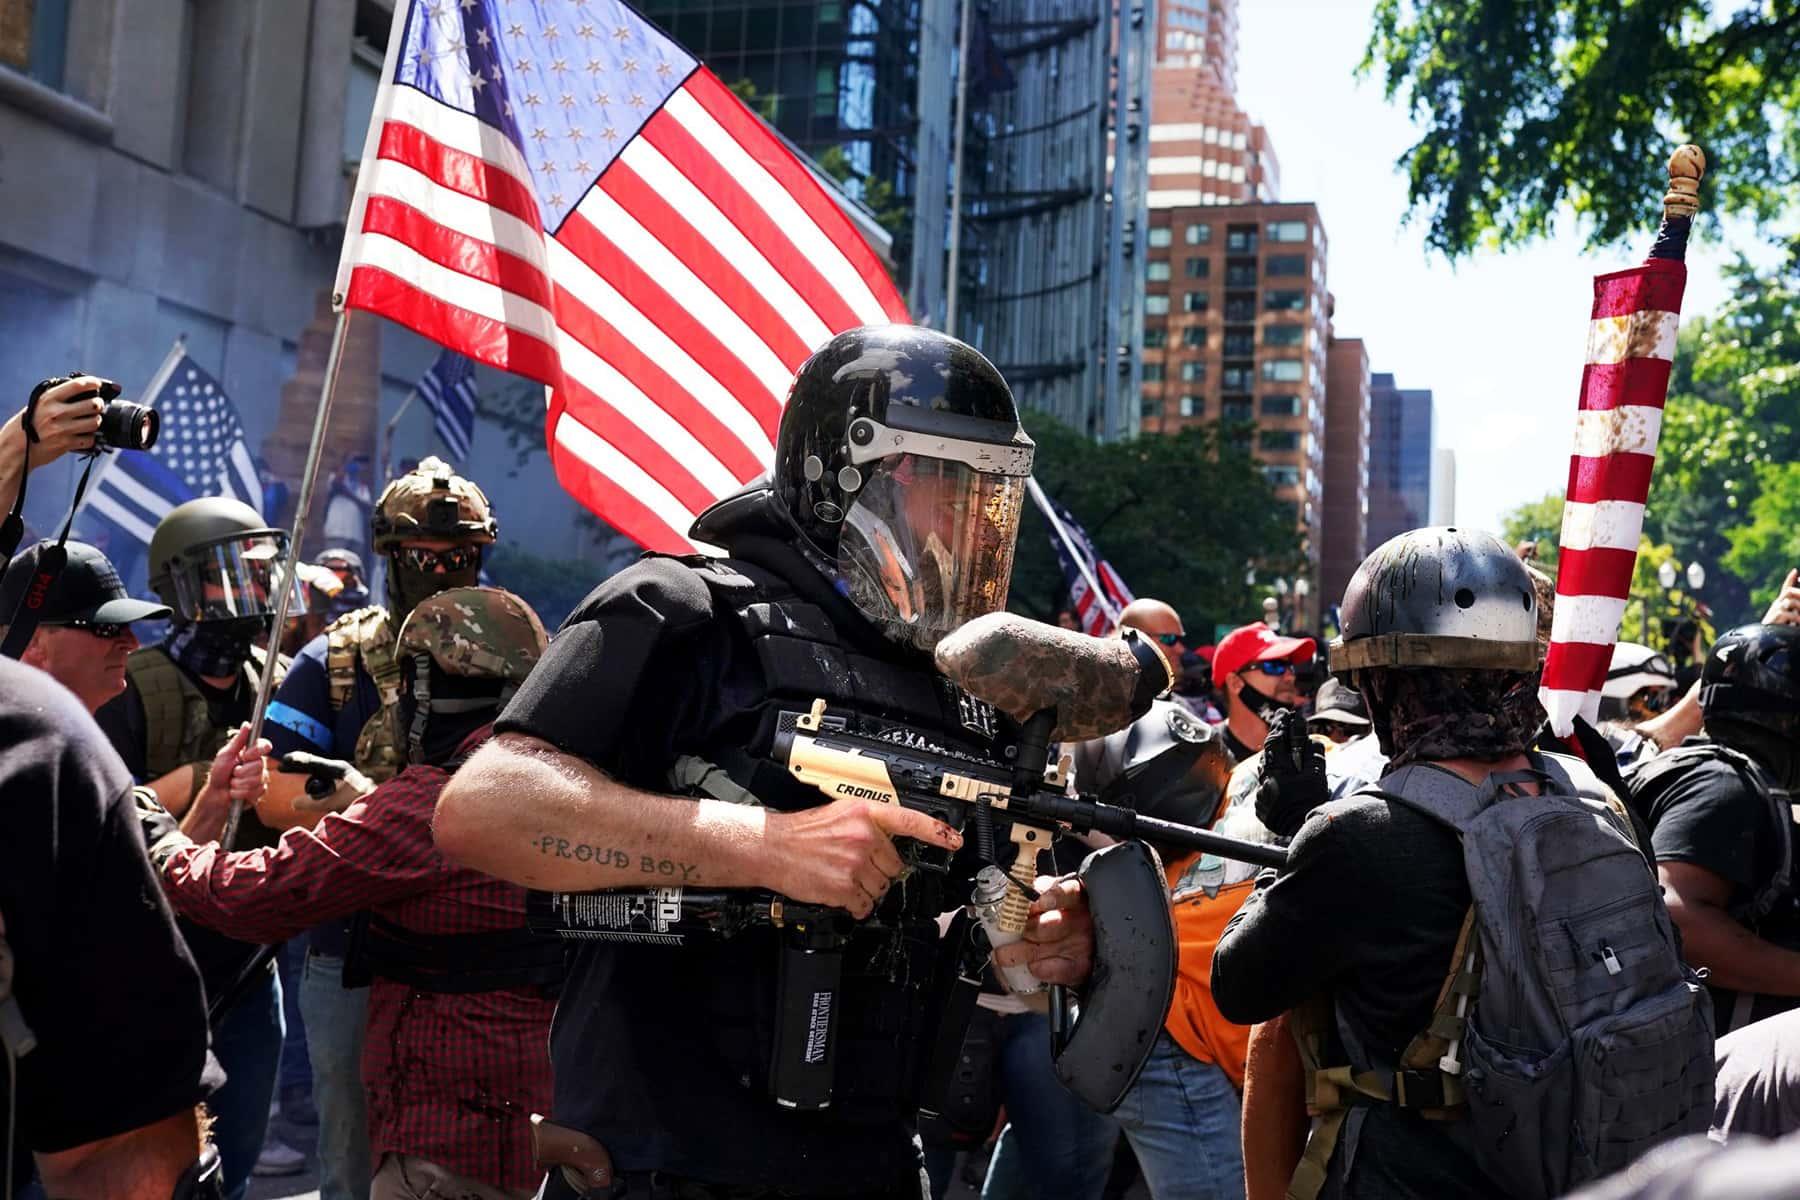 101520_whiteextremists_02